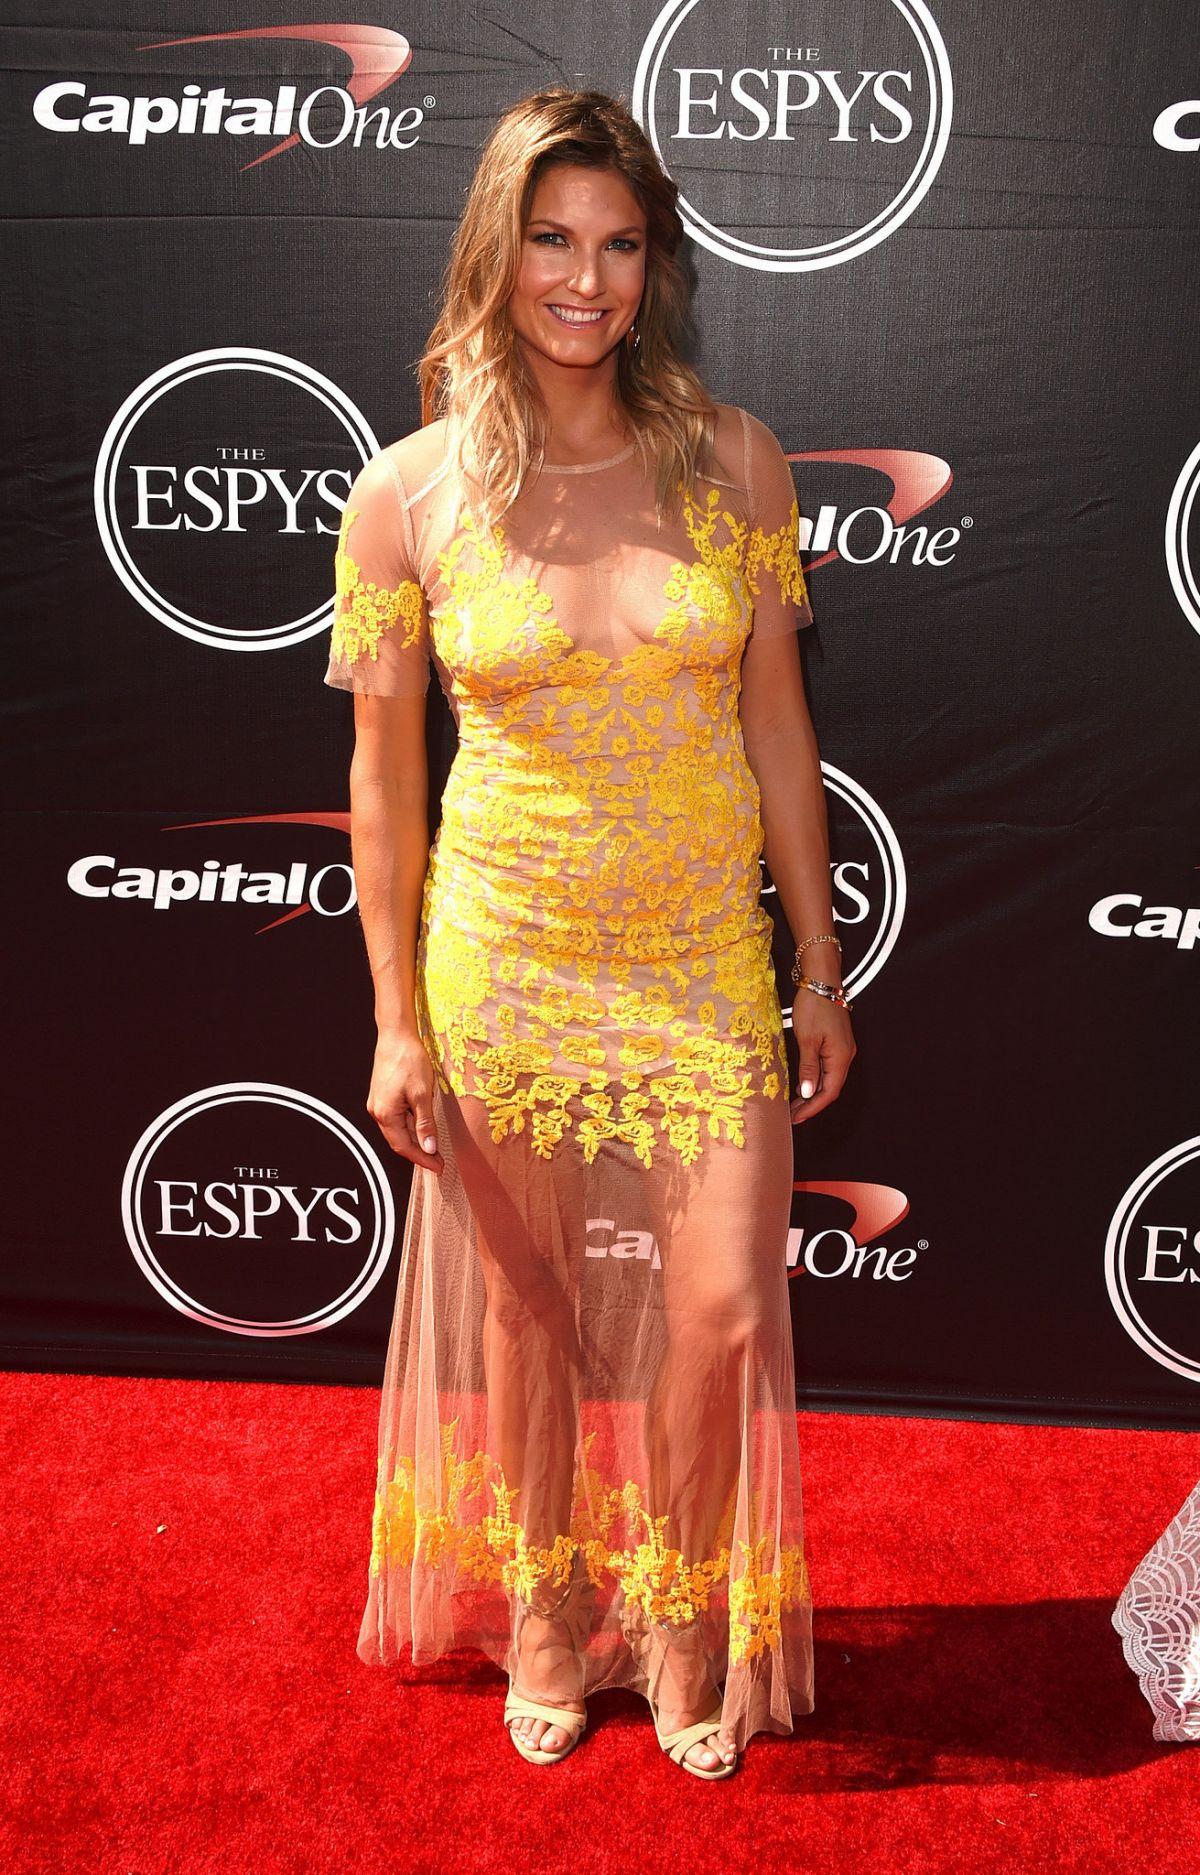 JULIA MANCUSO at 2015 Espys Awards in Los Angeles